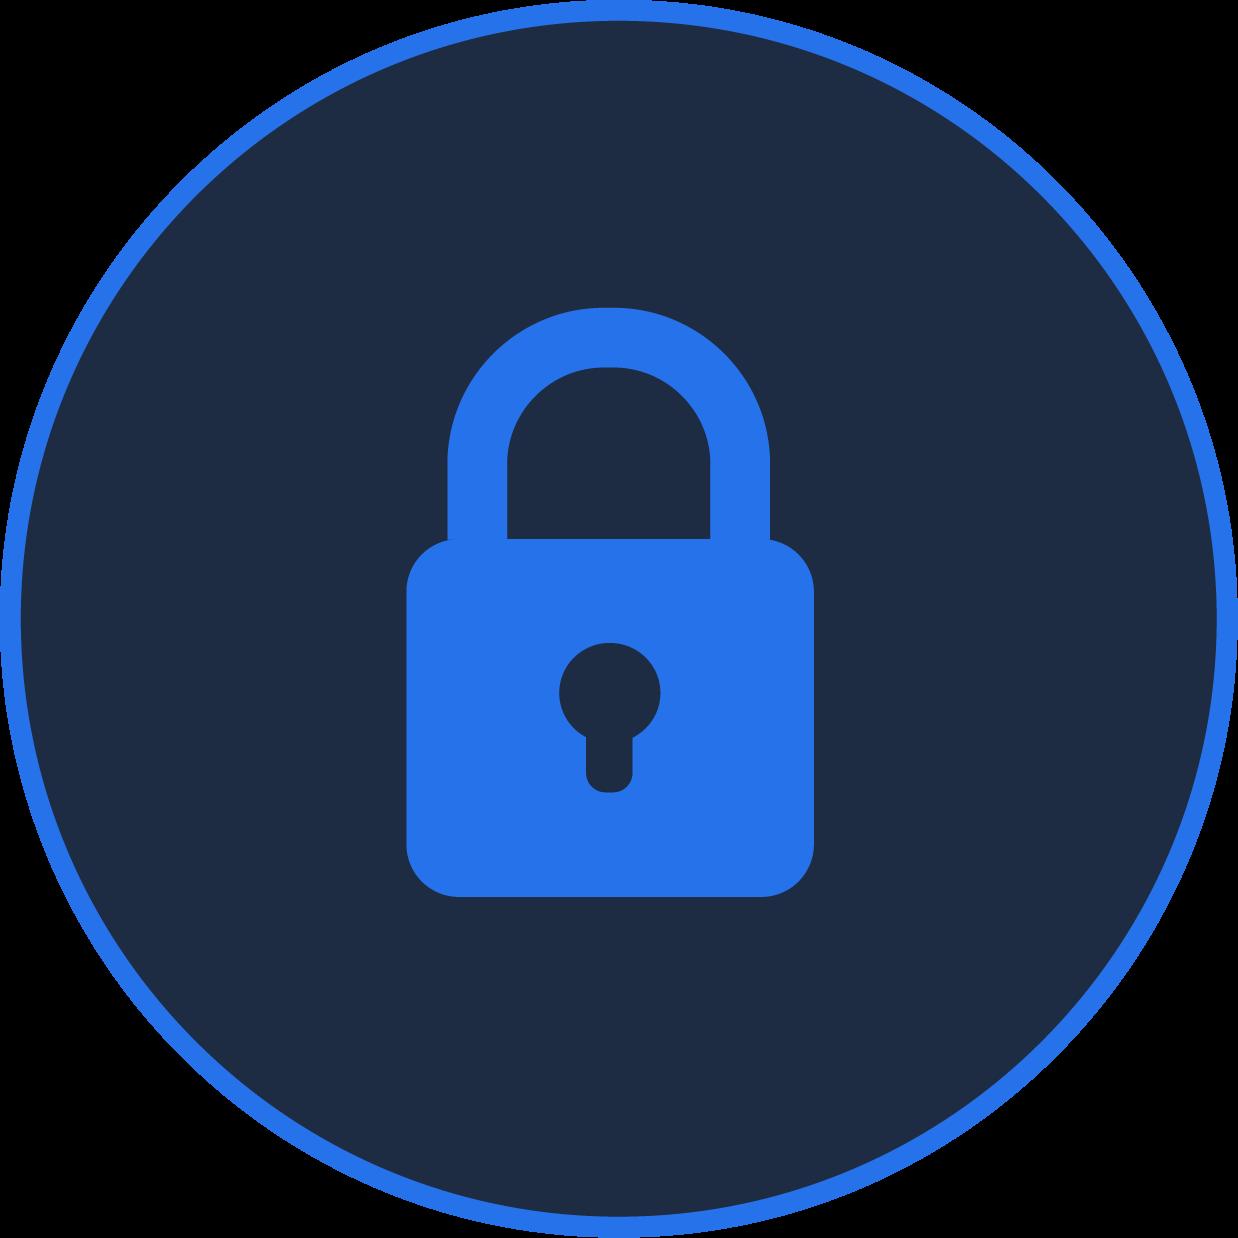 Security badge